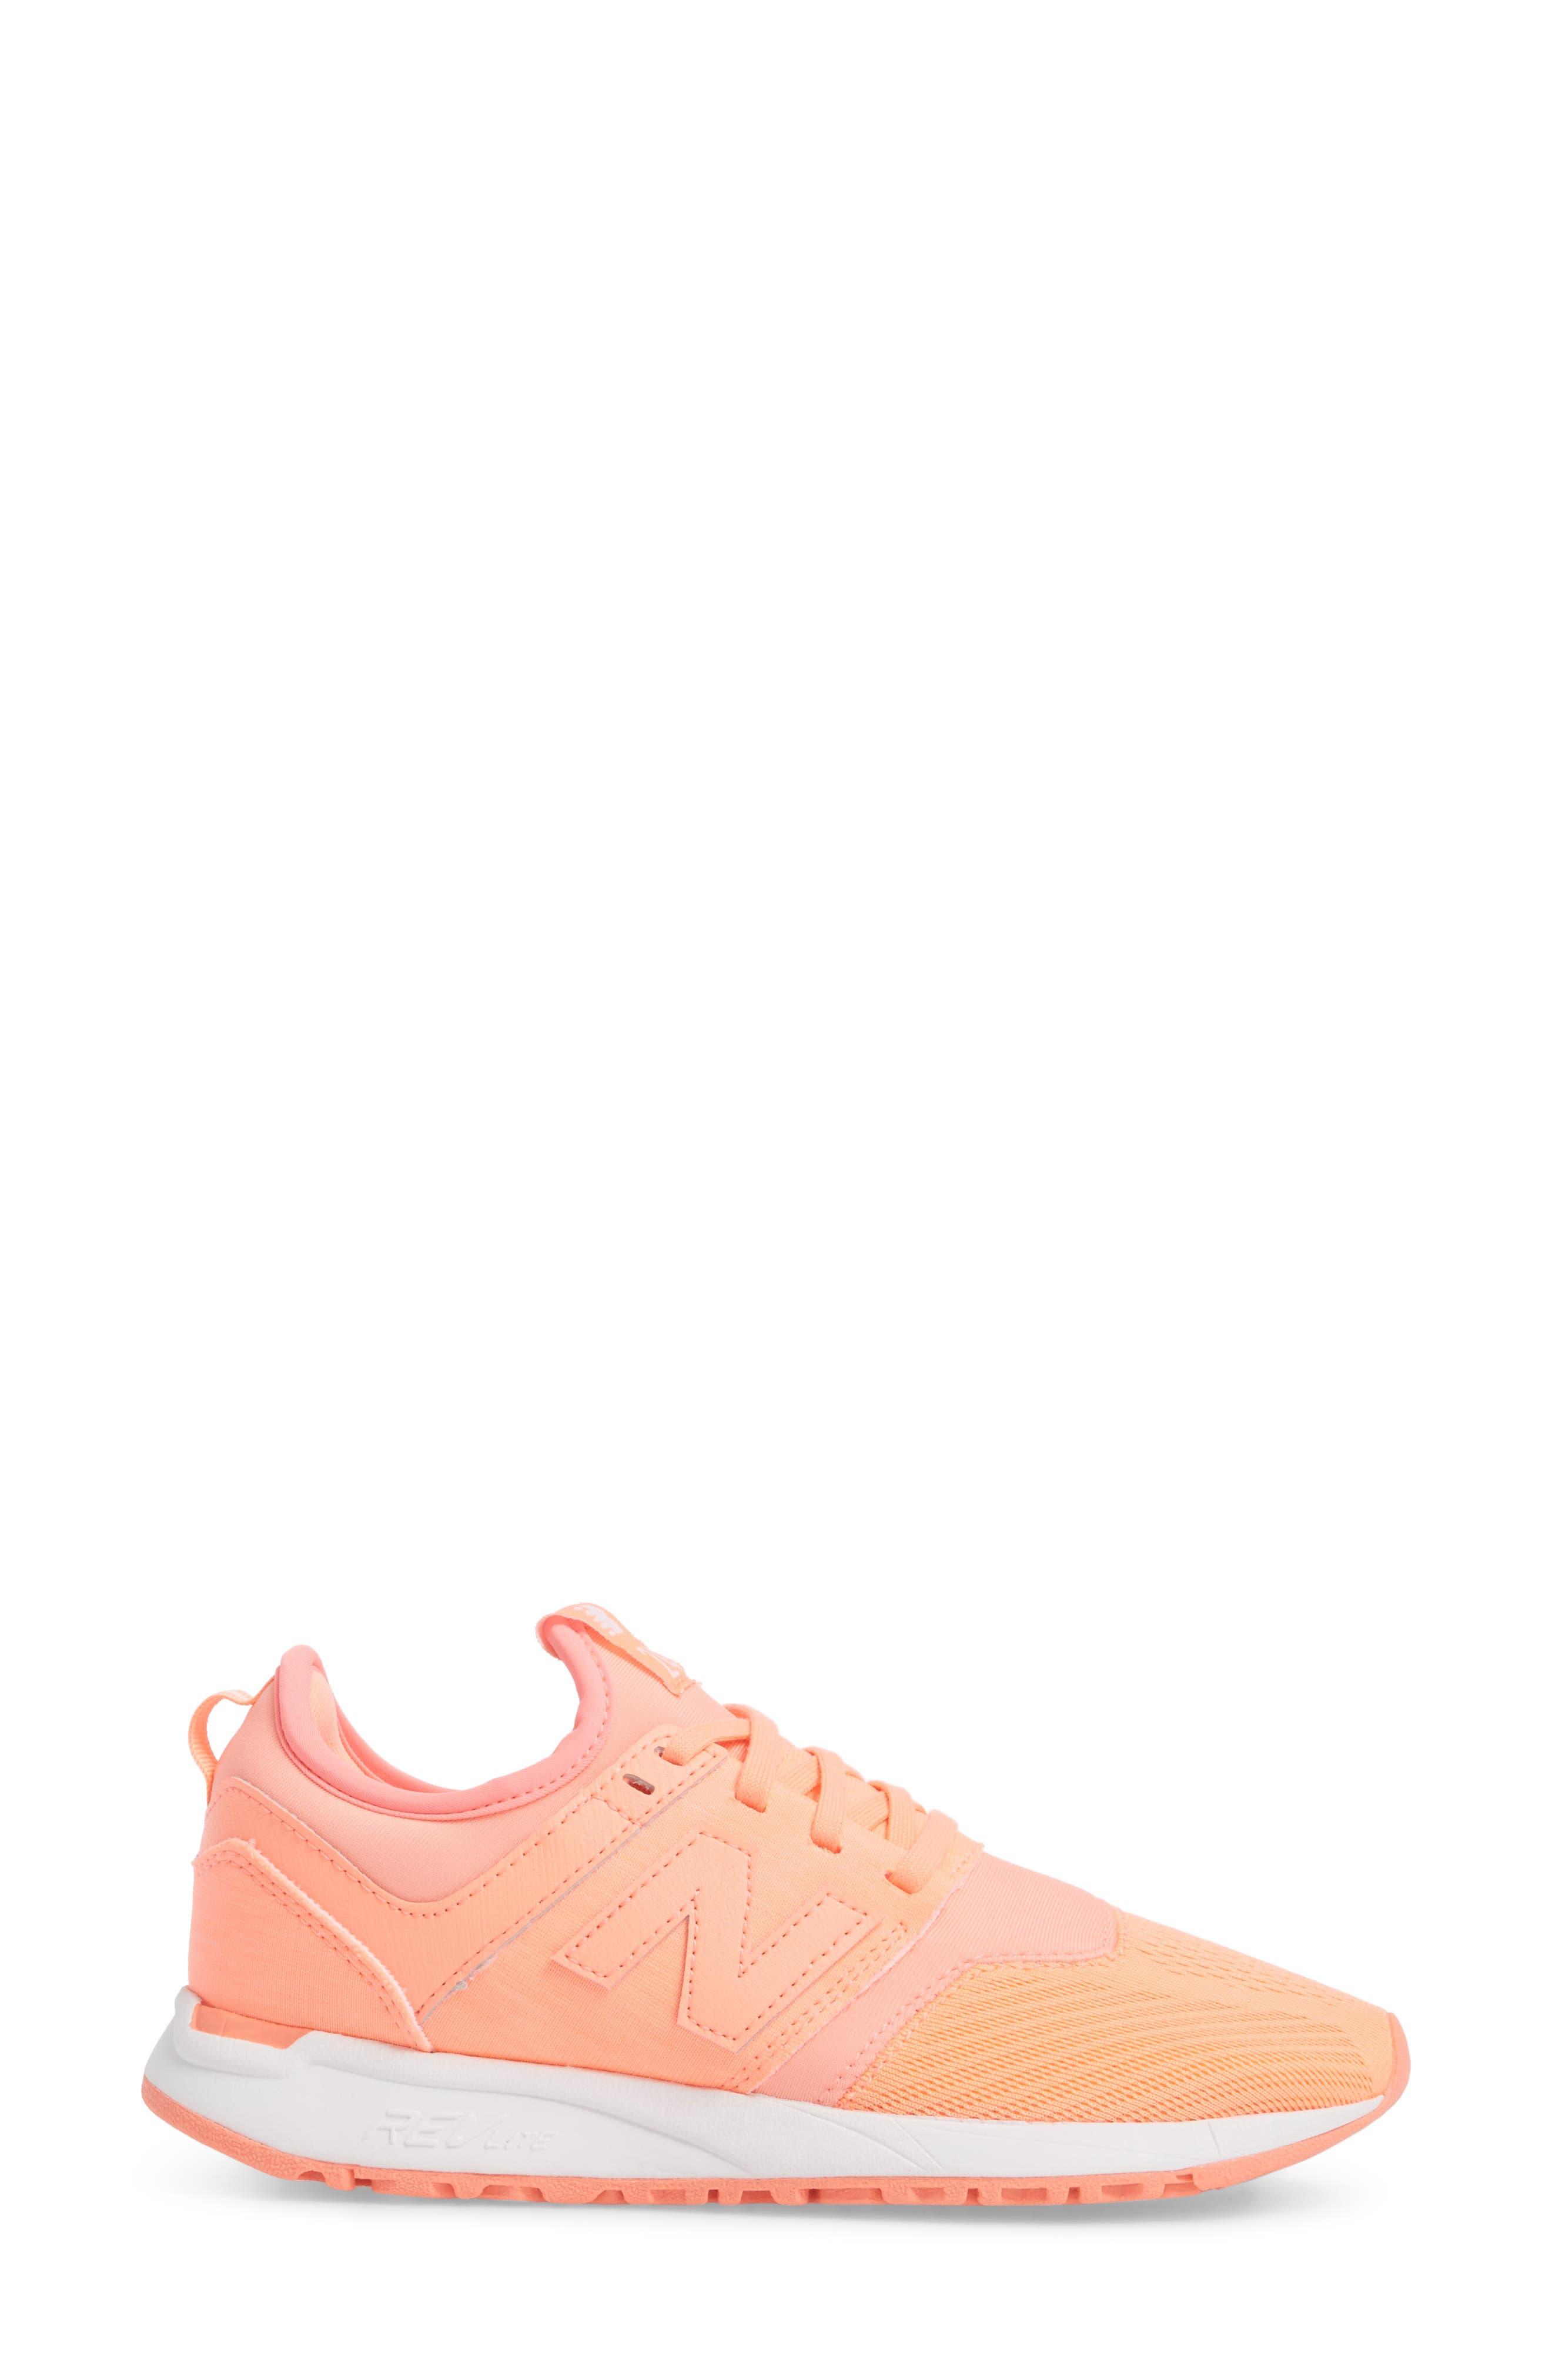 247 Classic Sneaker,                             Alternate thumbnail 3, color,                             Fiji